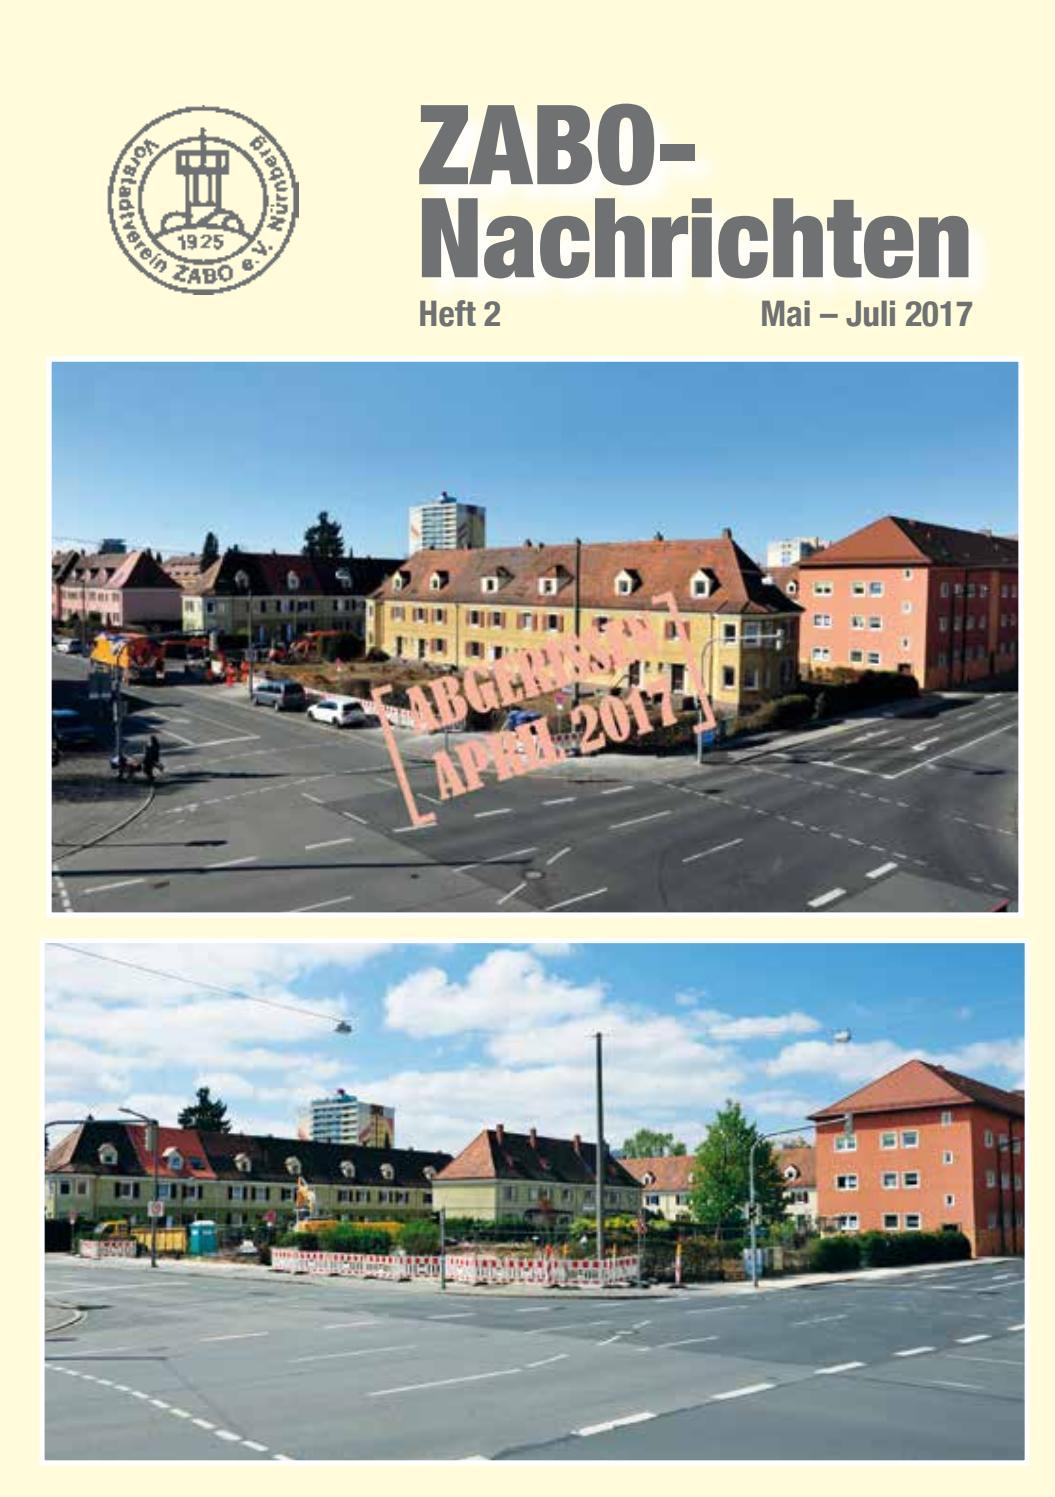 Zabo Nachrichten 2017 Heft 2 By Vorstadtverein Zabo E V